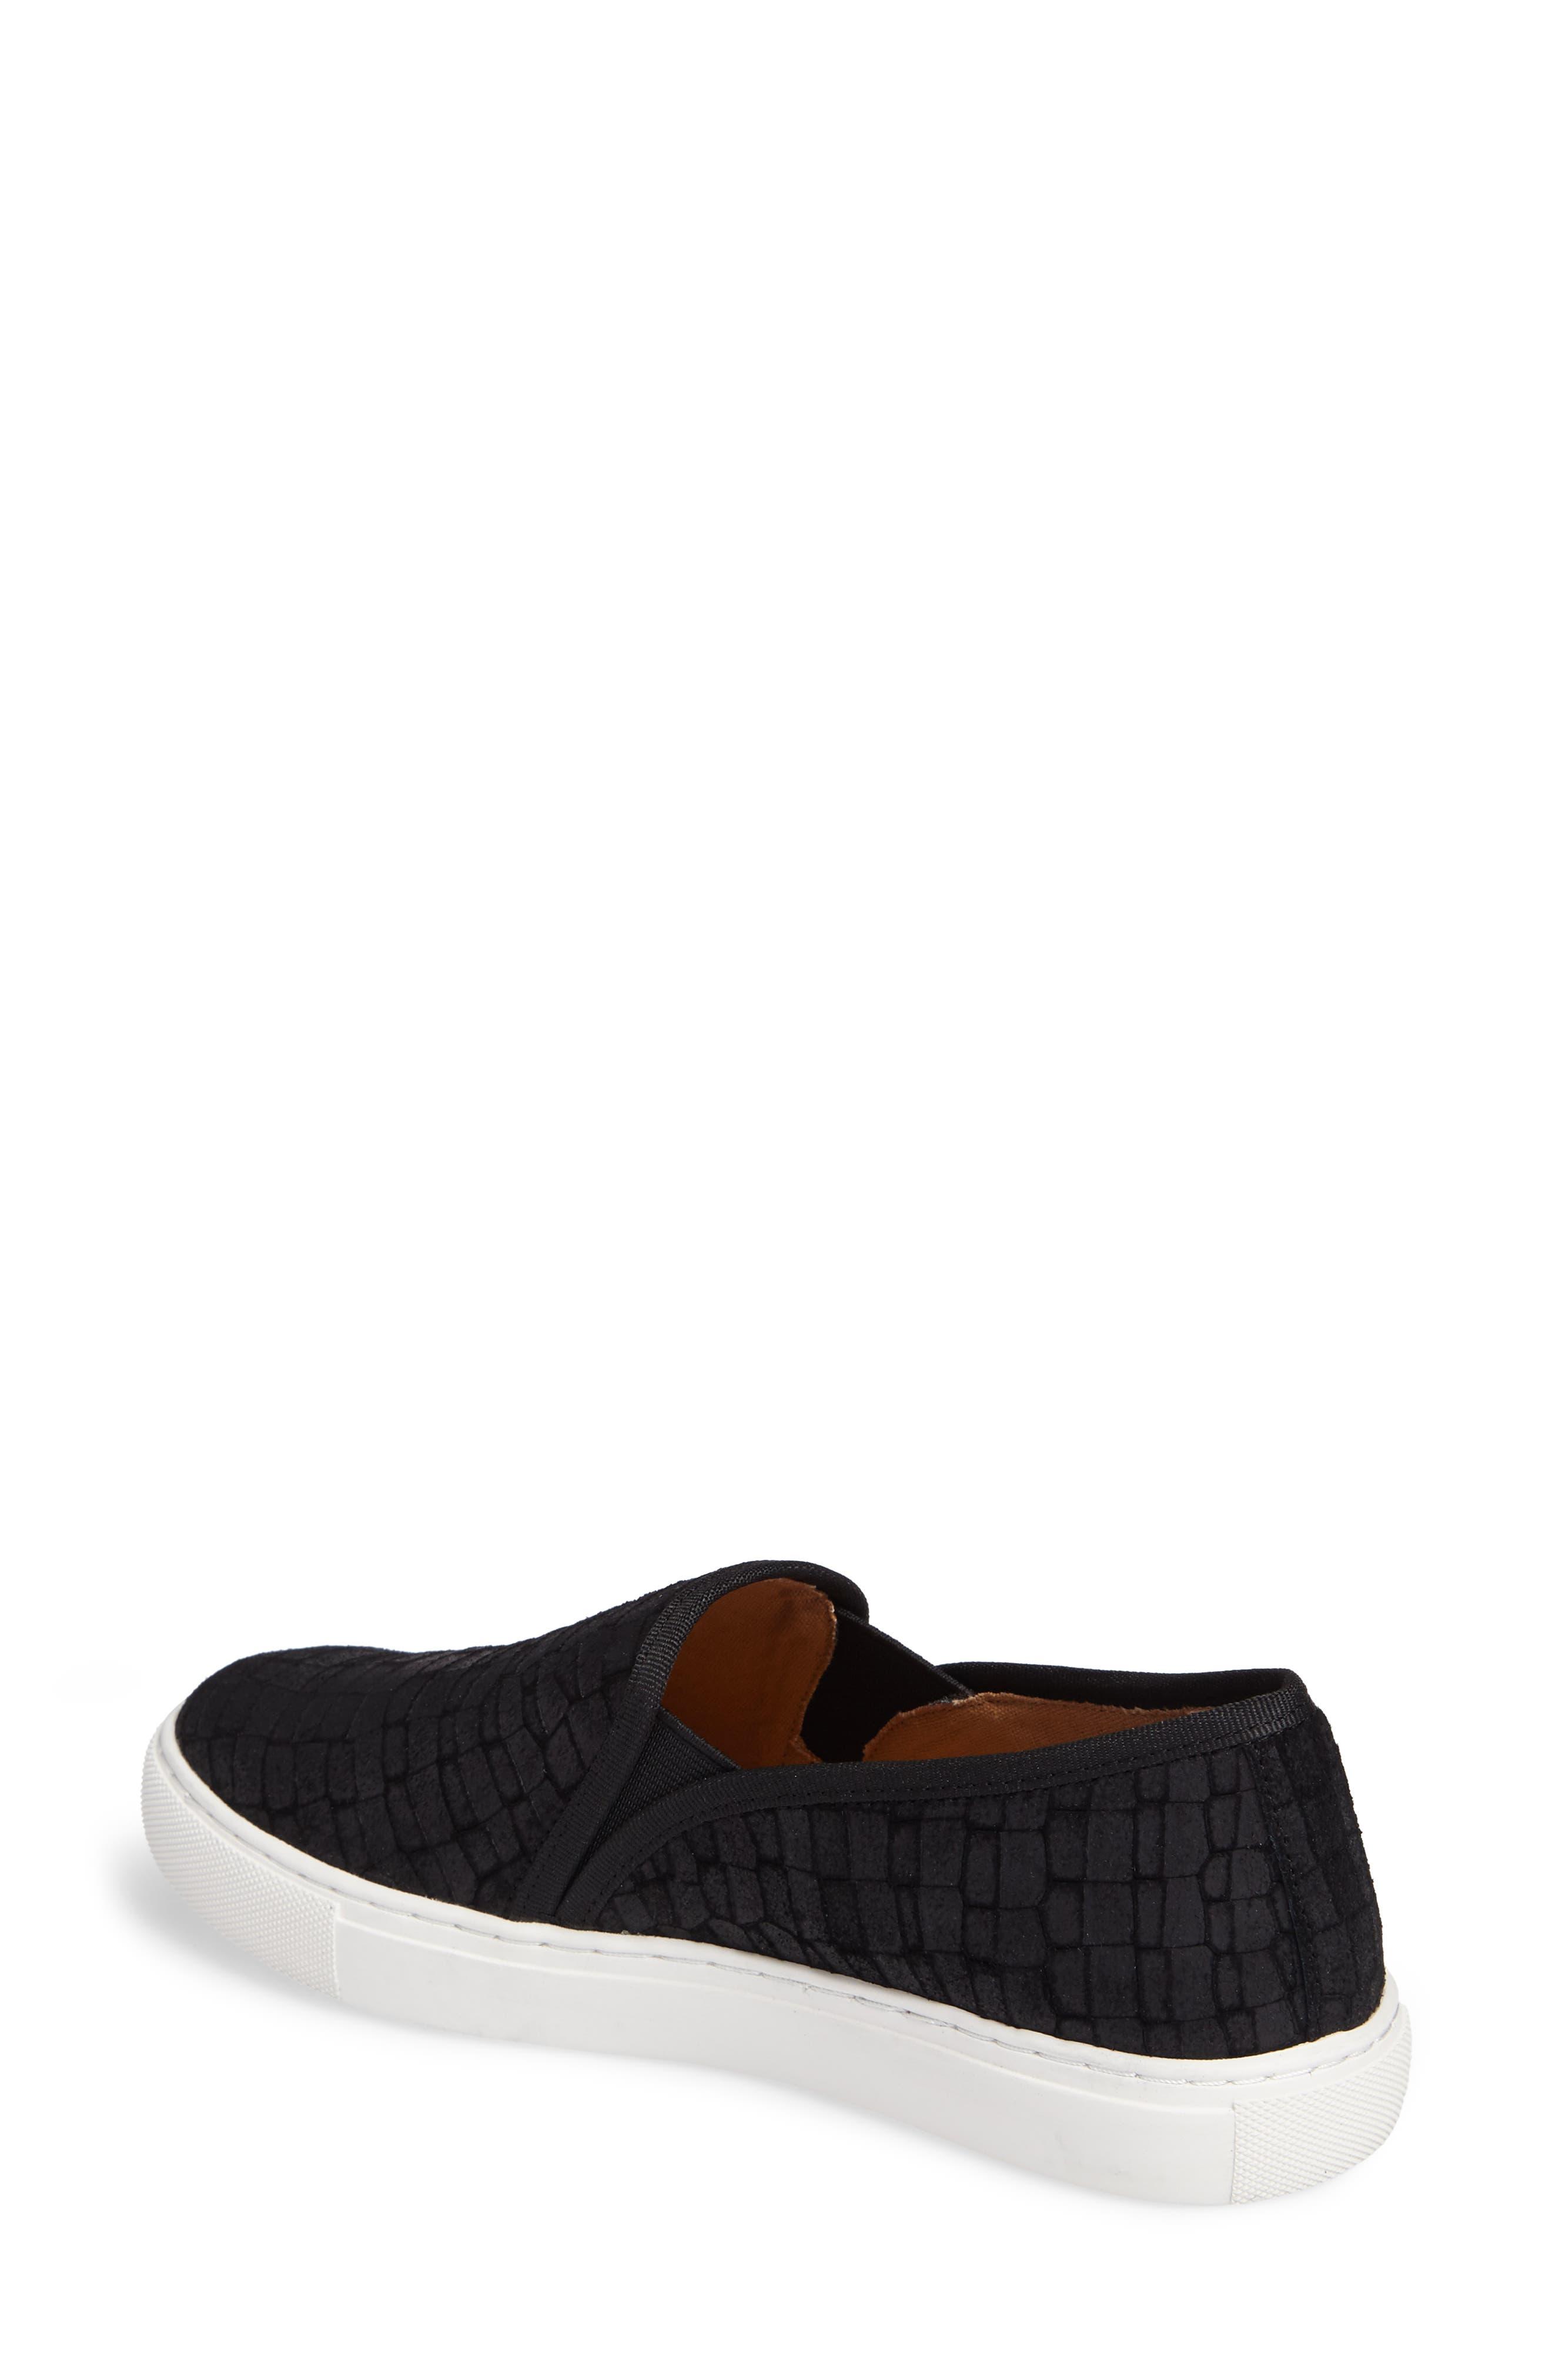 CC Corso Como Skipper Slip-On Sneaker,                             Alternate thumbnail 2, color,                             002